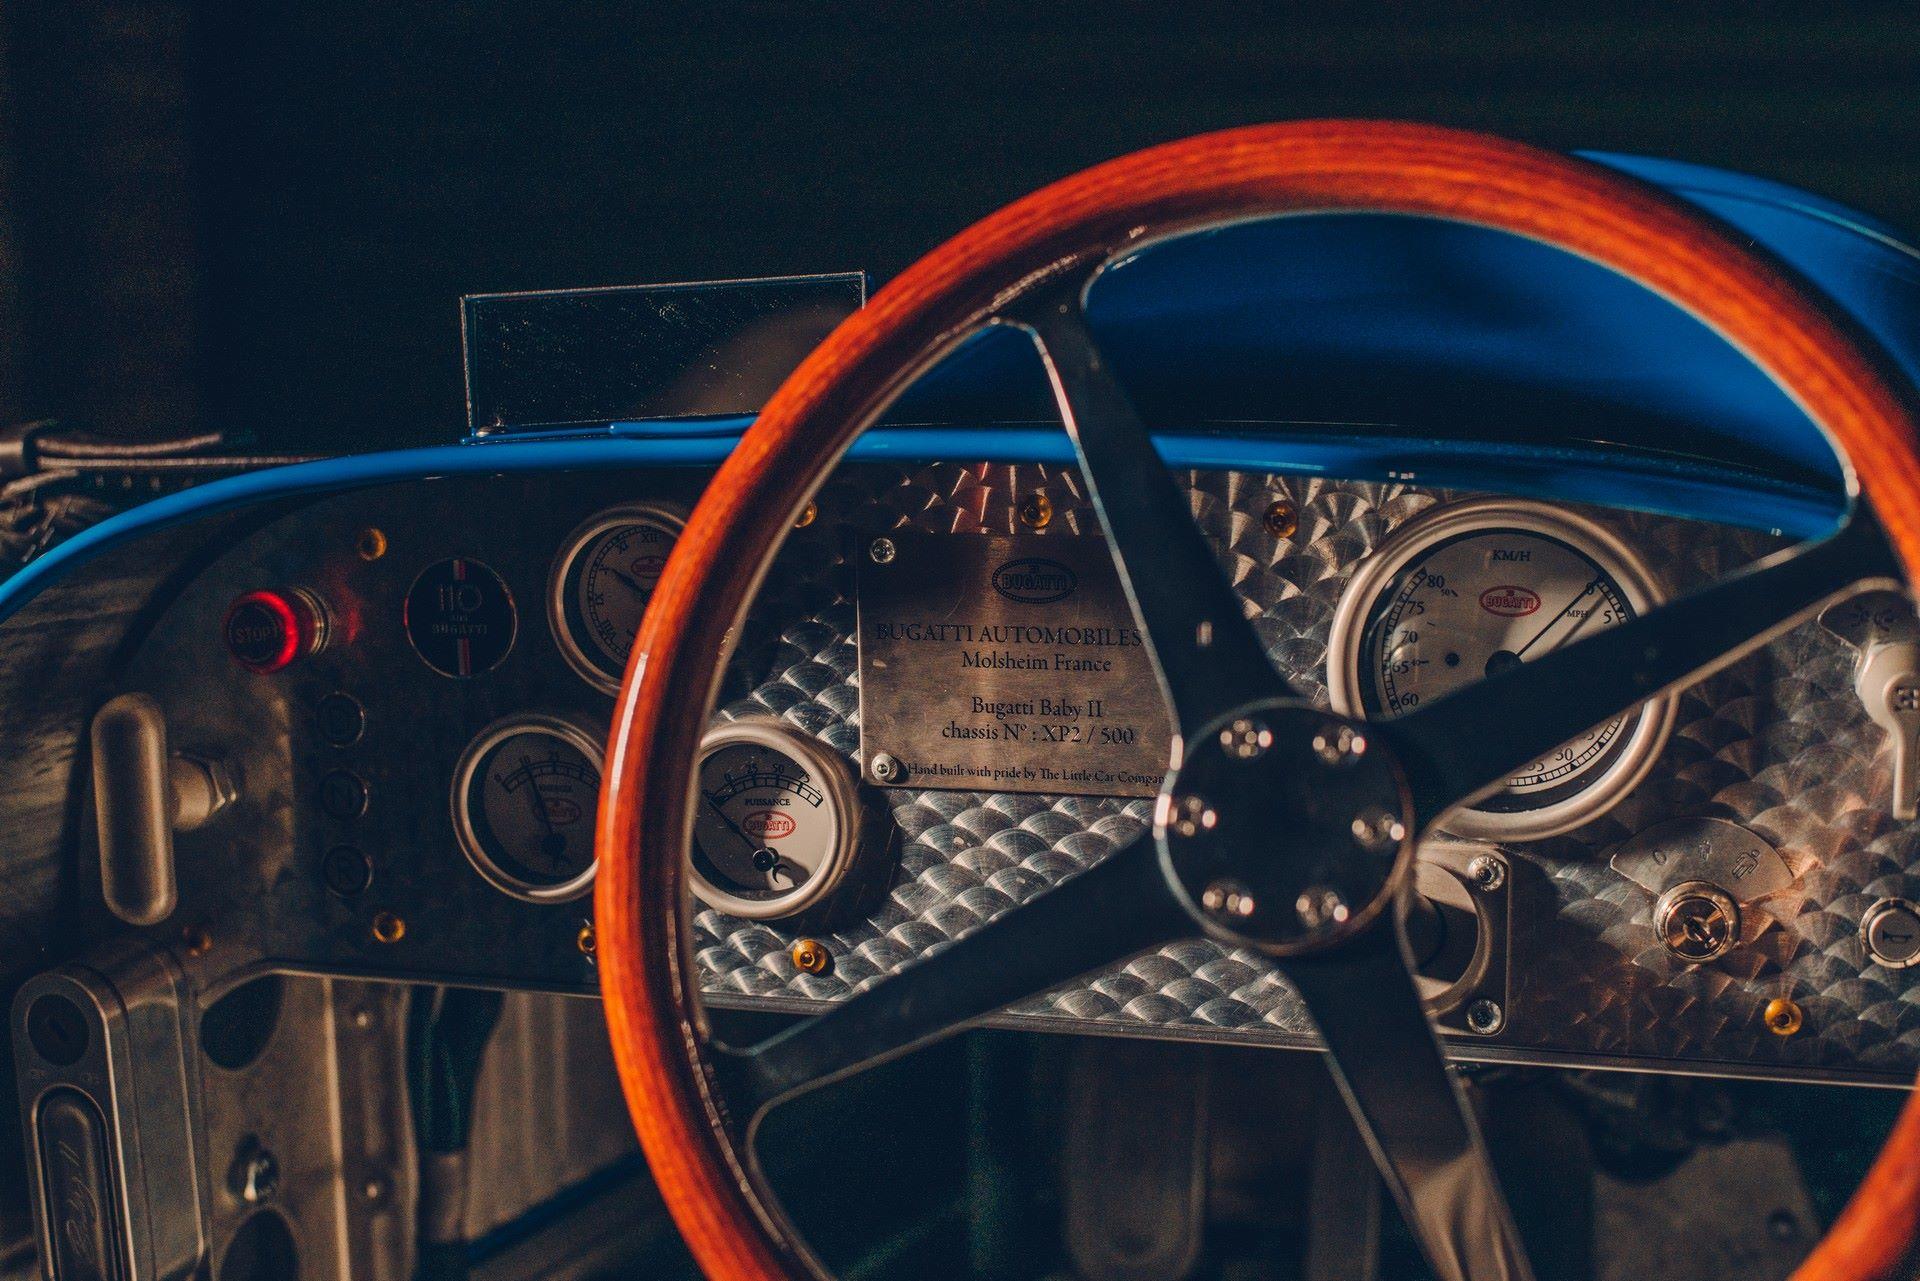 Bugatti-Baby-II-production-version-9